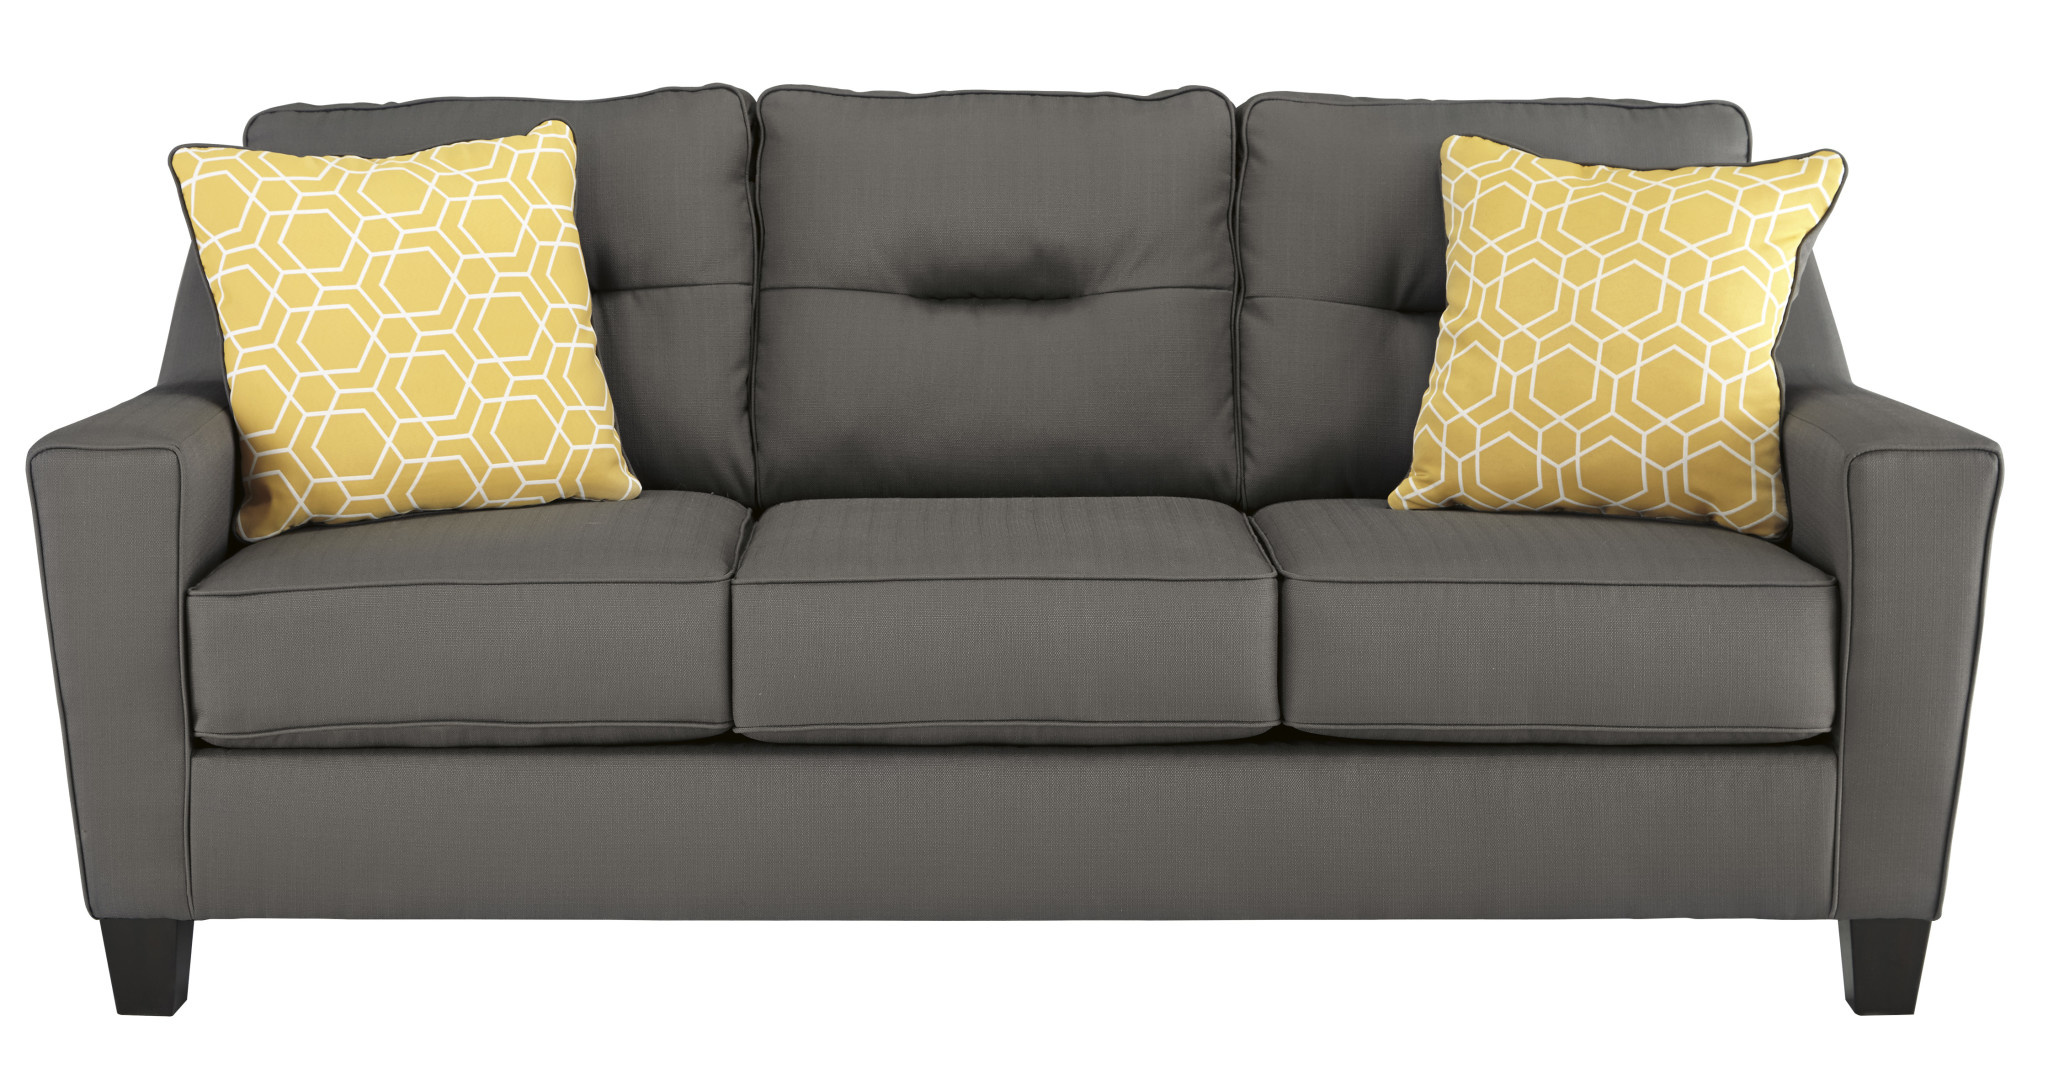 Benchcraft Forsan Nuvella Sofa- Gray 6690238